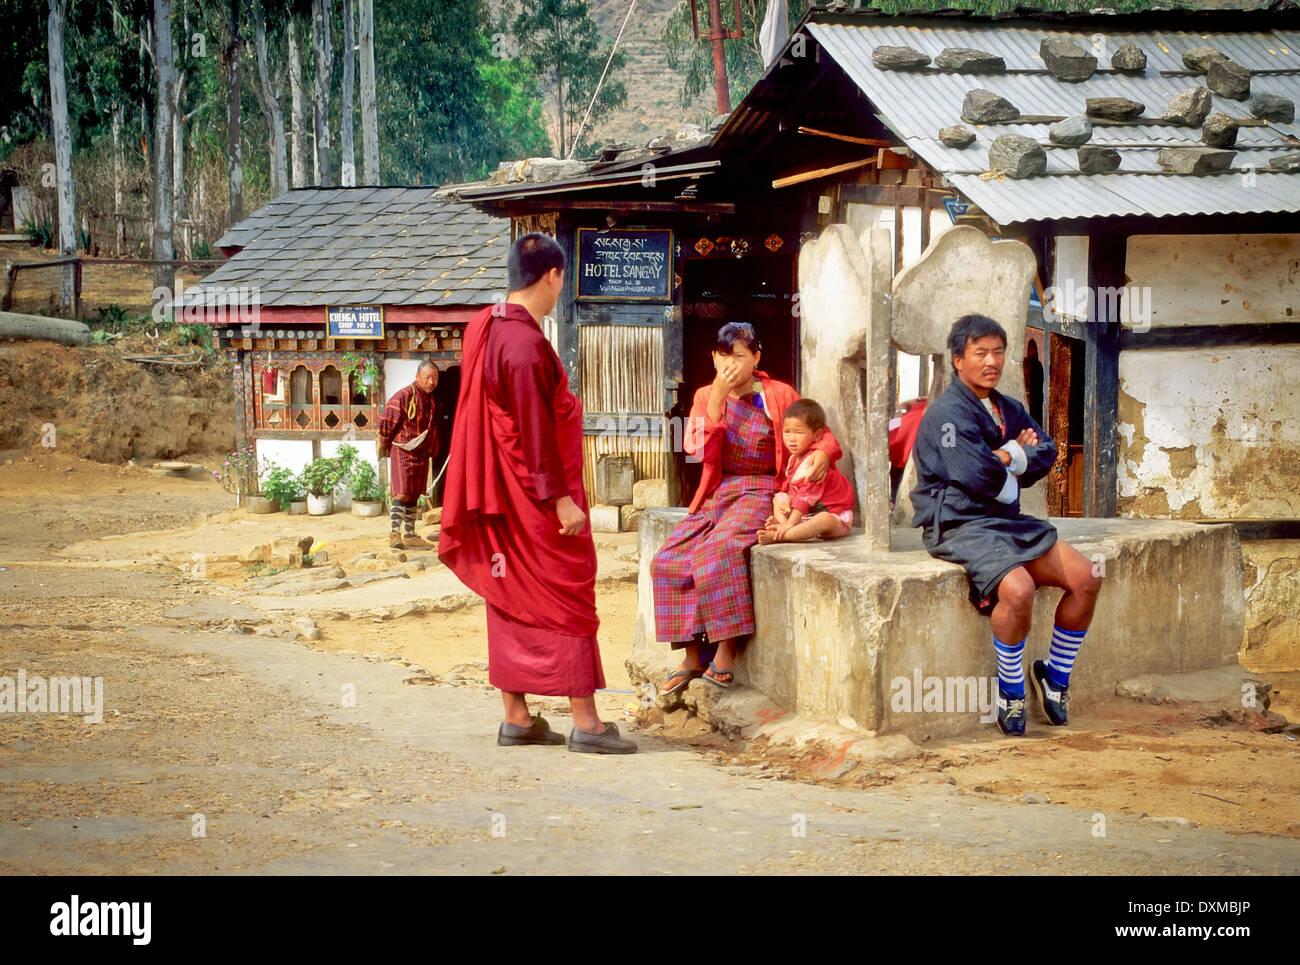 Bhutanese people waiting for the bus in Wangde Phodrung. Digitally Manipulated Image. Stylised by sharpening i - Stock Image